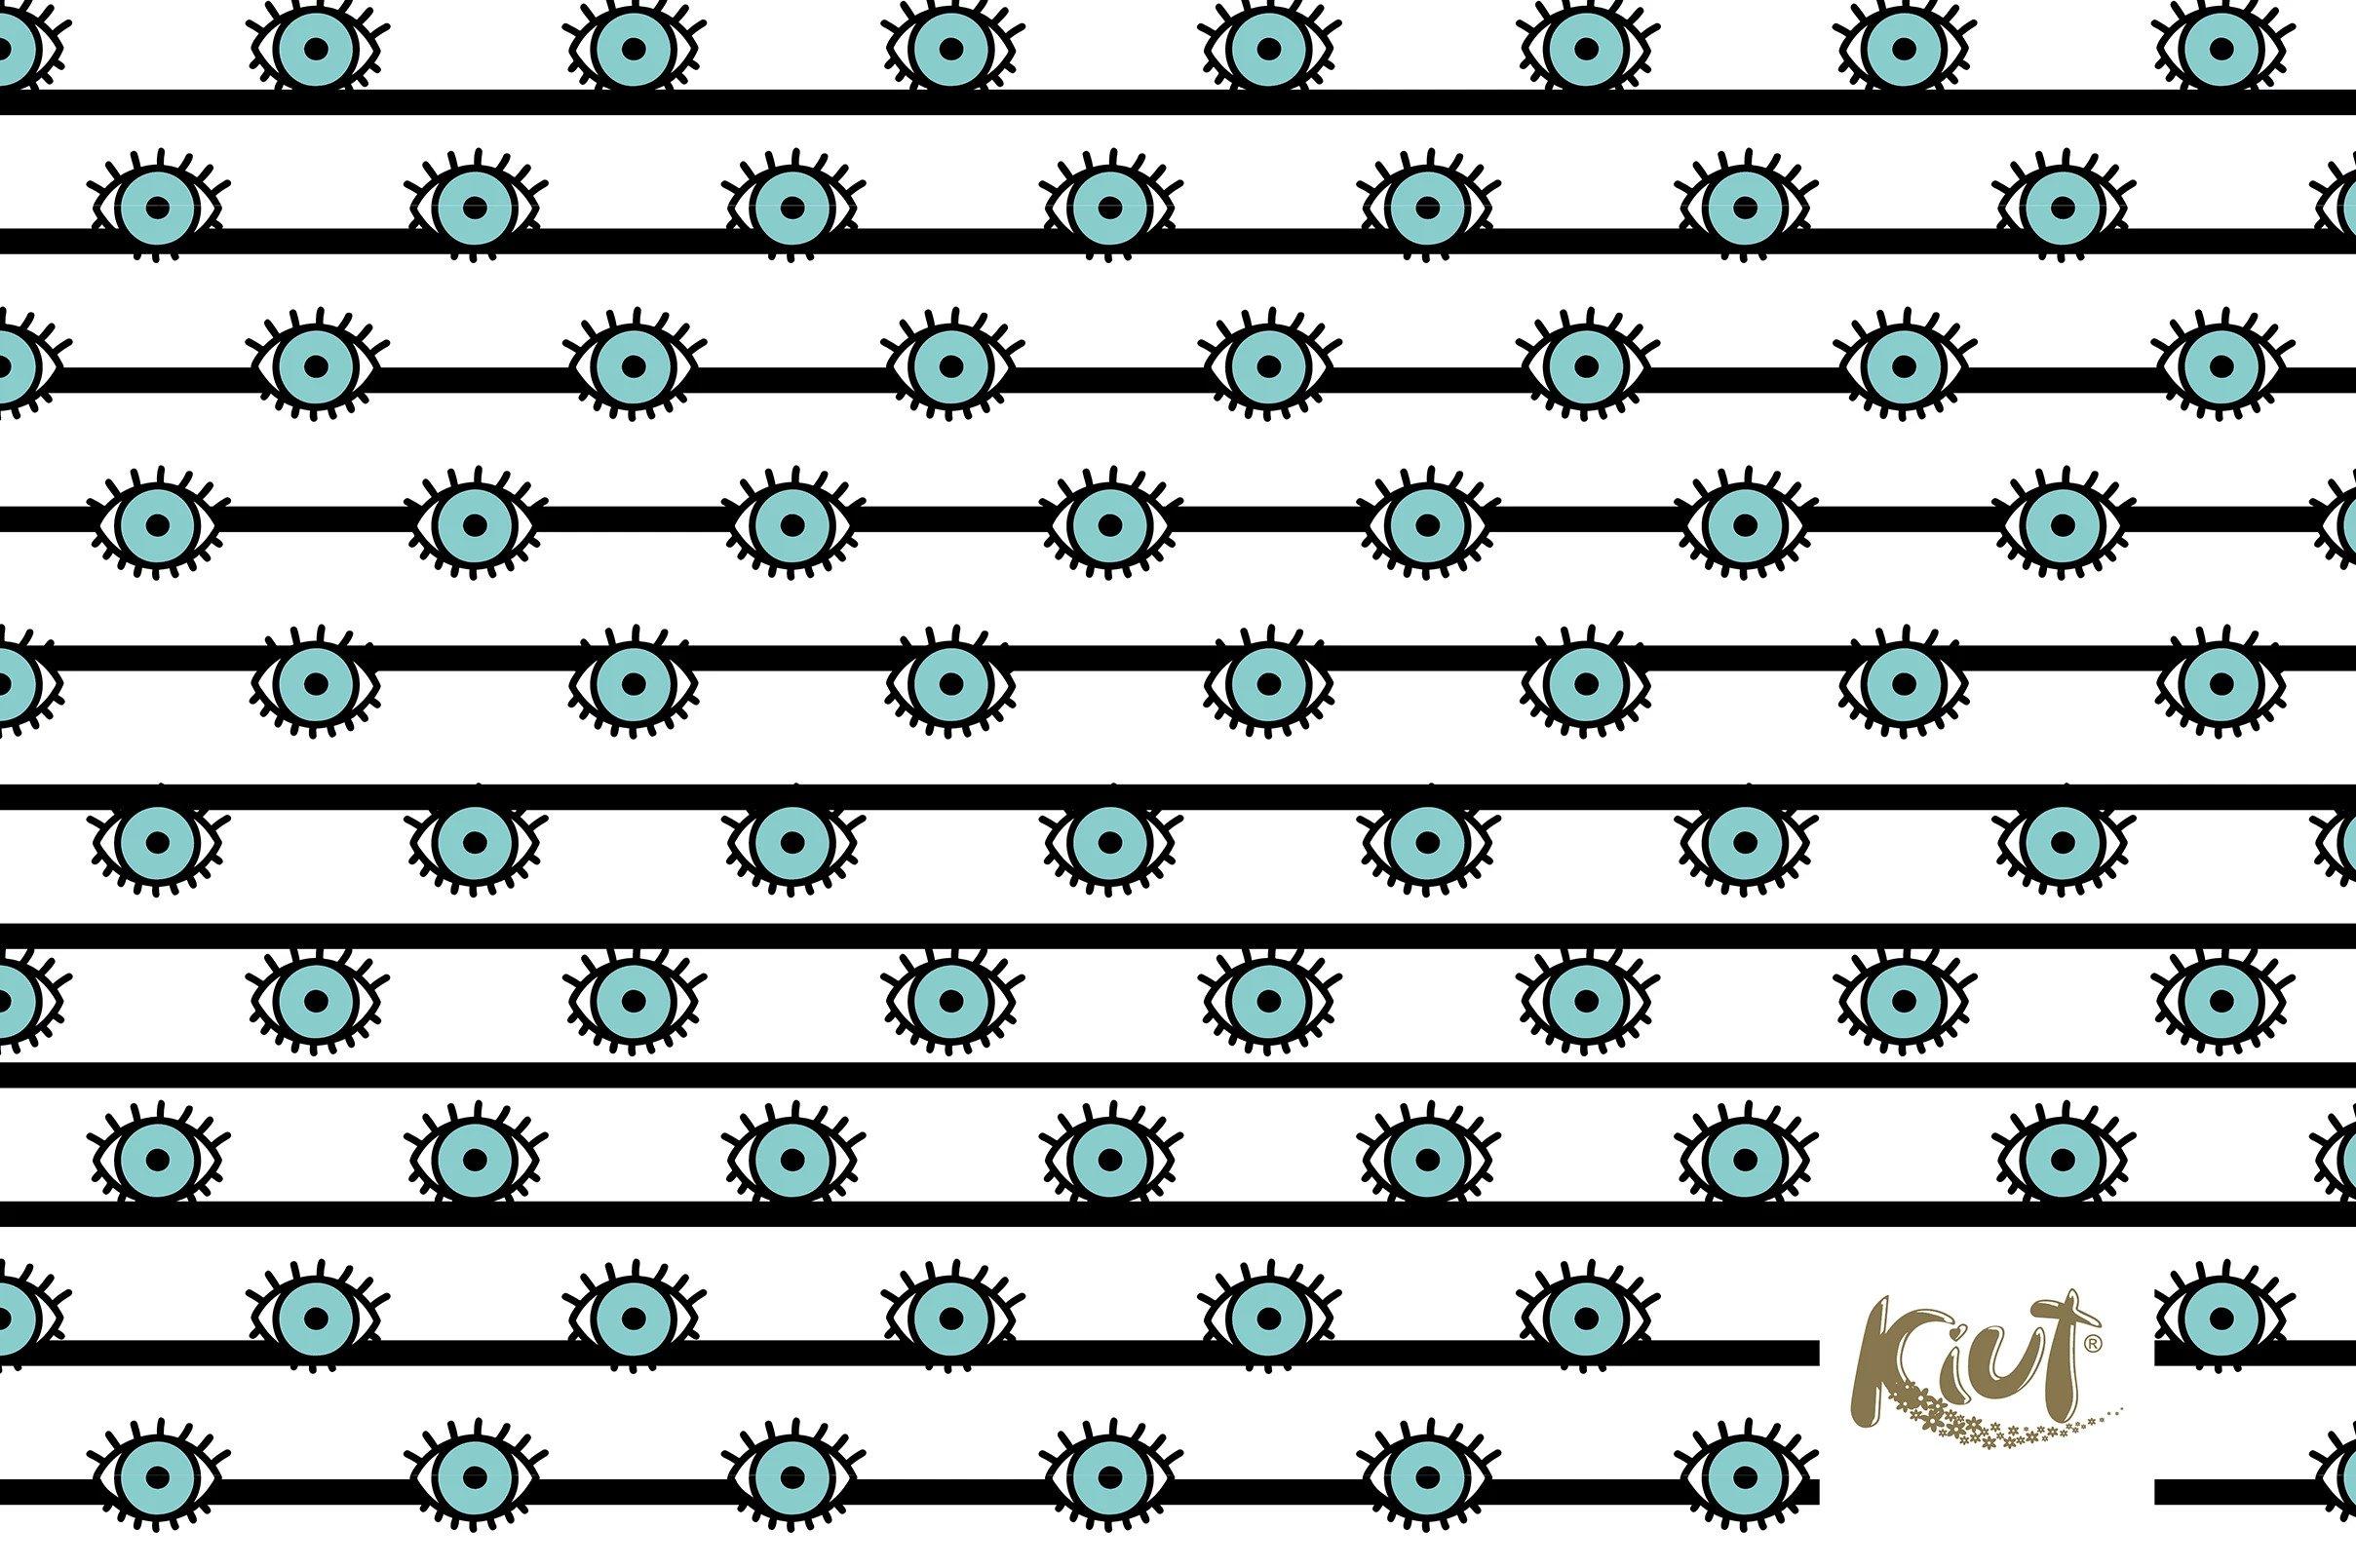 Fondos de pantalla Kiut Patrón de ojos